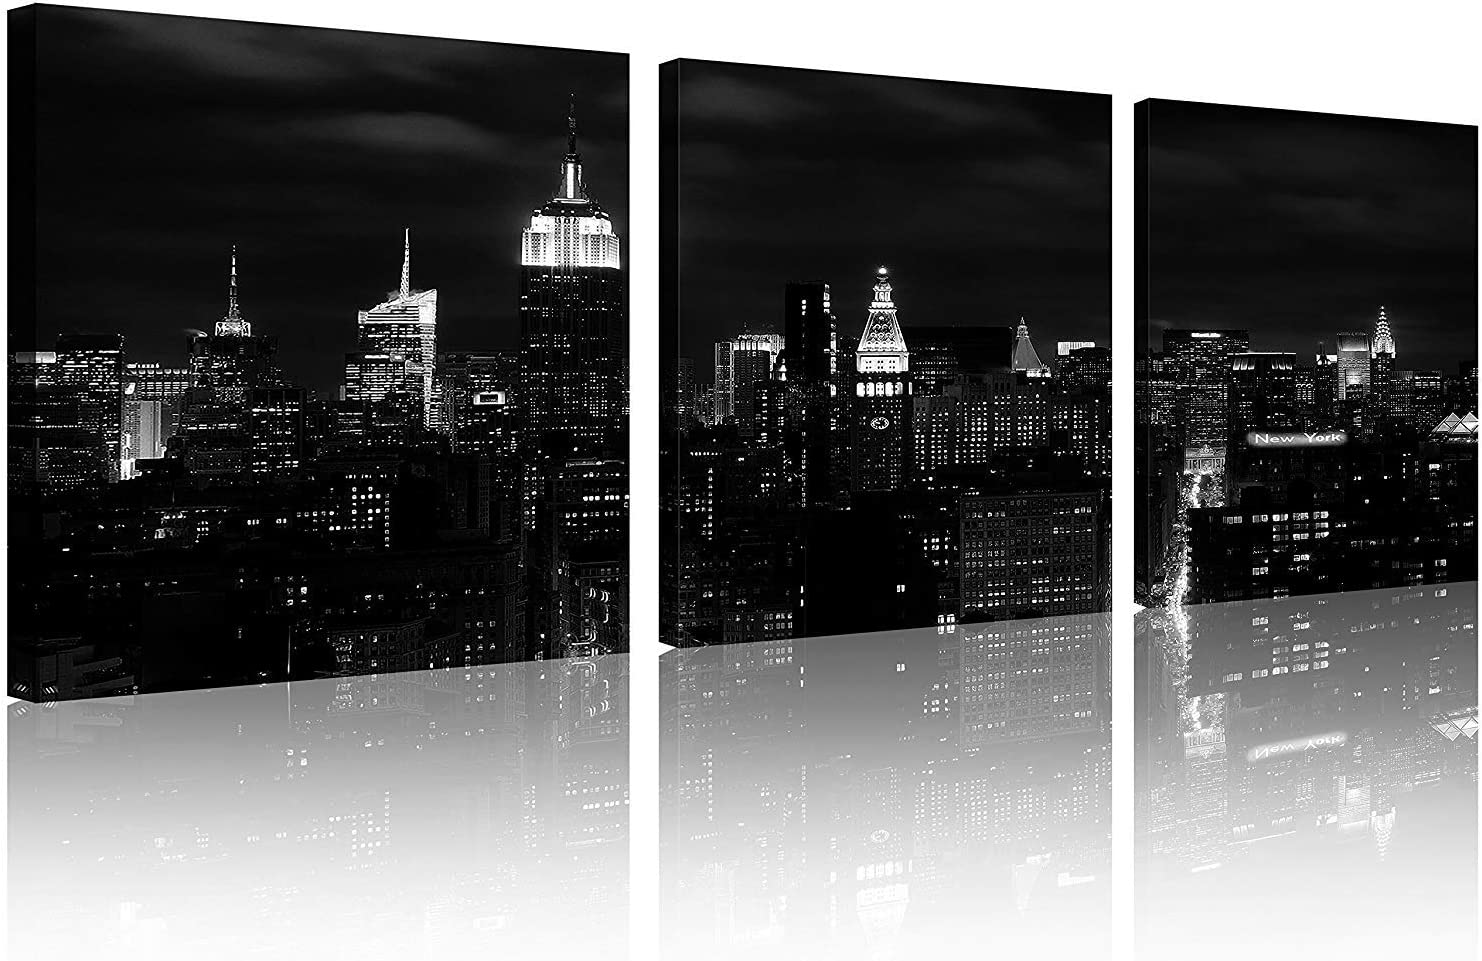 TutuBeer 3 Panels nyc Art nyc Prints nyc Black and White nyc Picture Black and White New York Pictures Print on Canvas Wall Art Skyline New York Wall Decor for Home Decor Wall Decor, 3pcs/Set